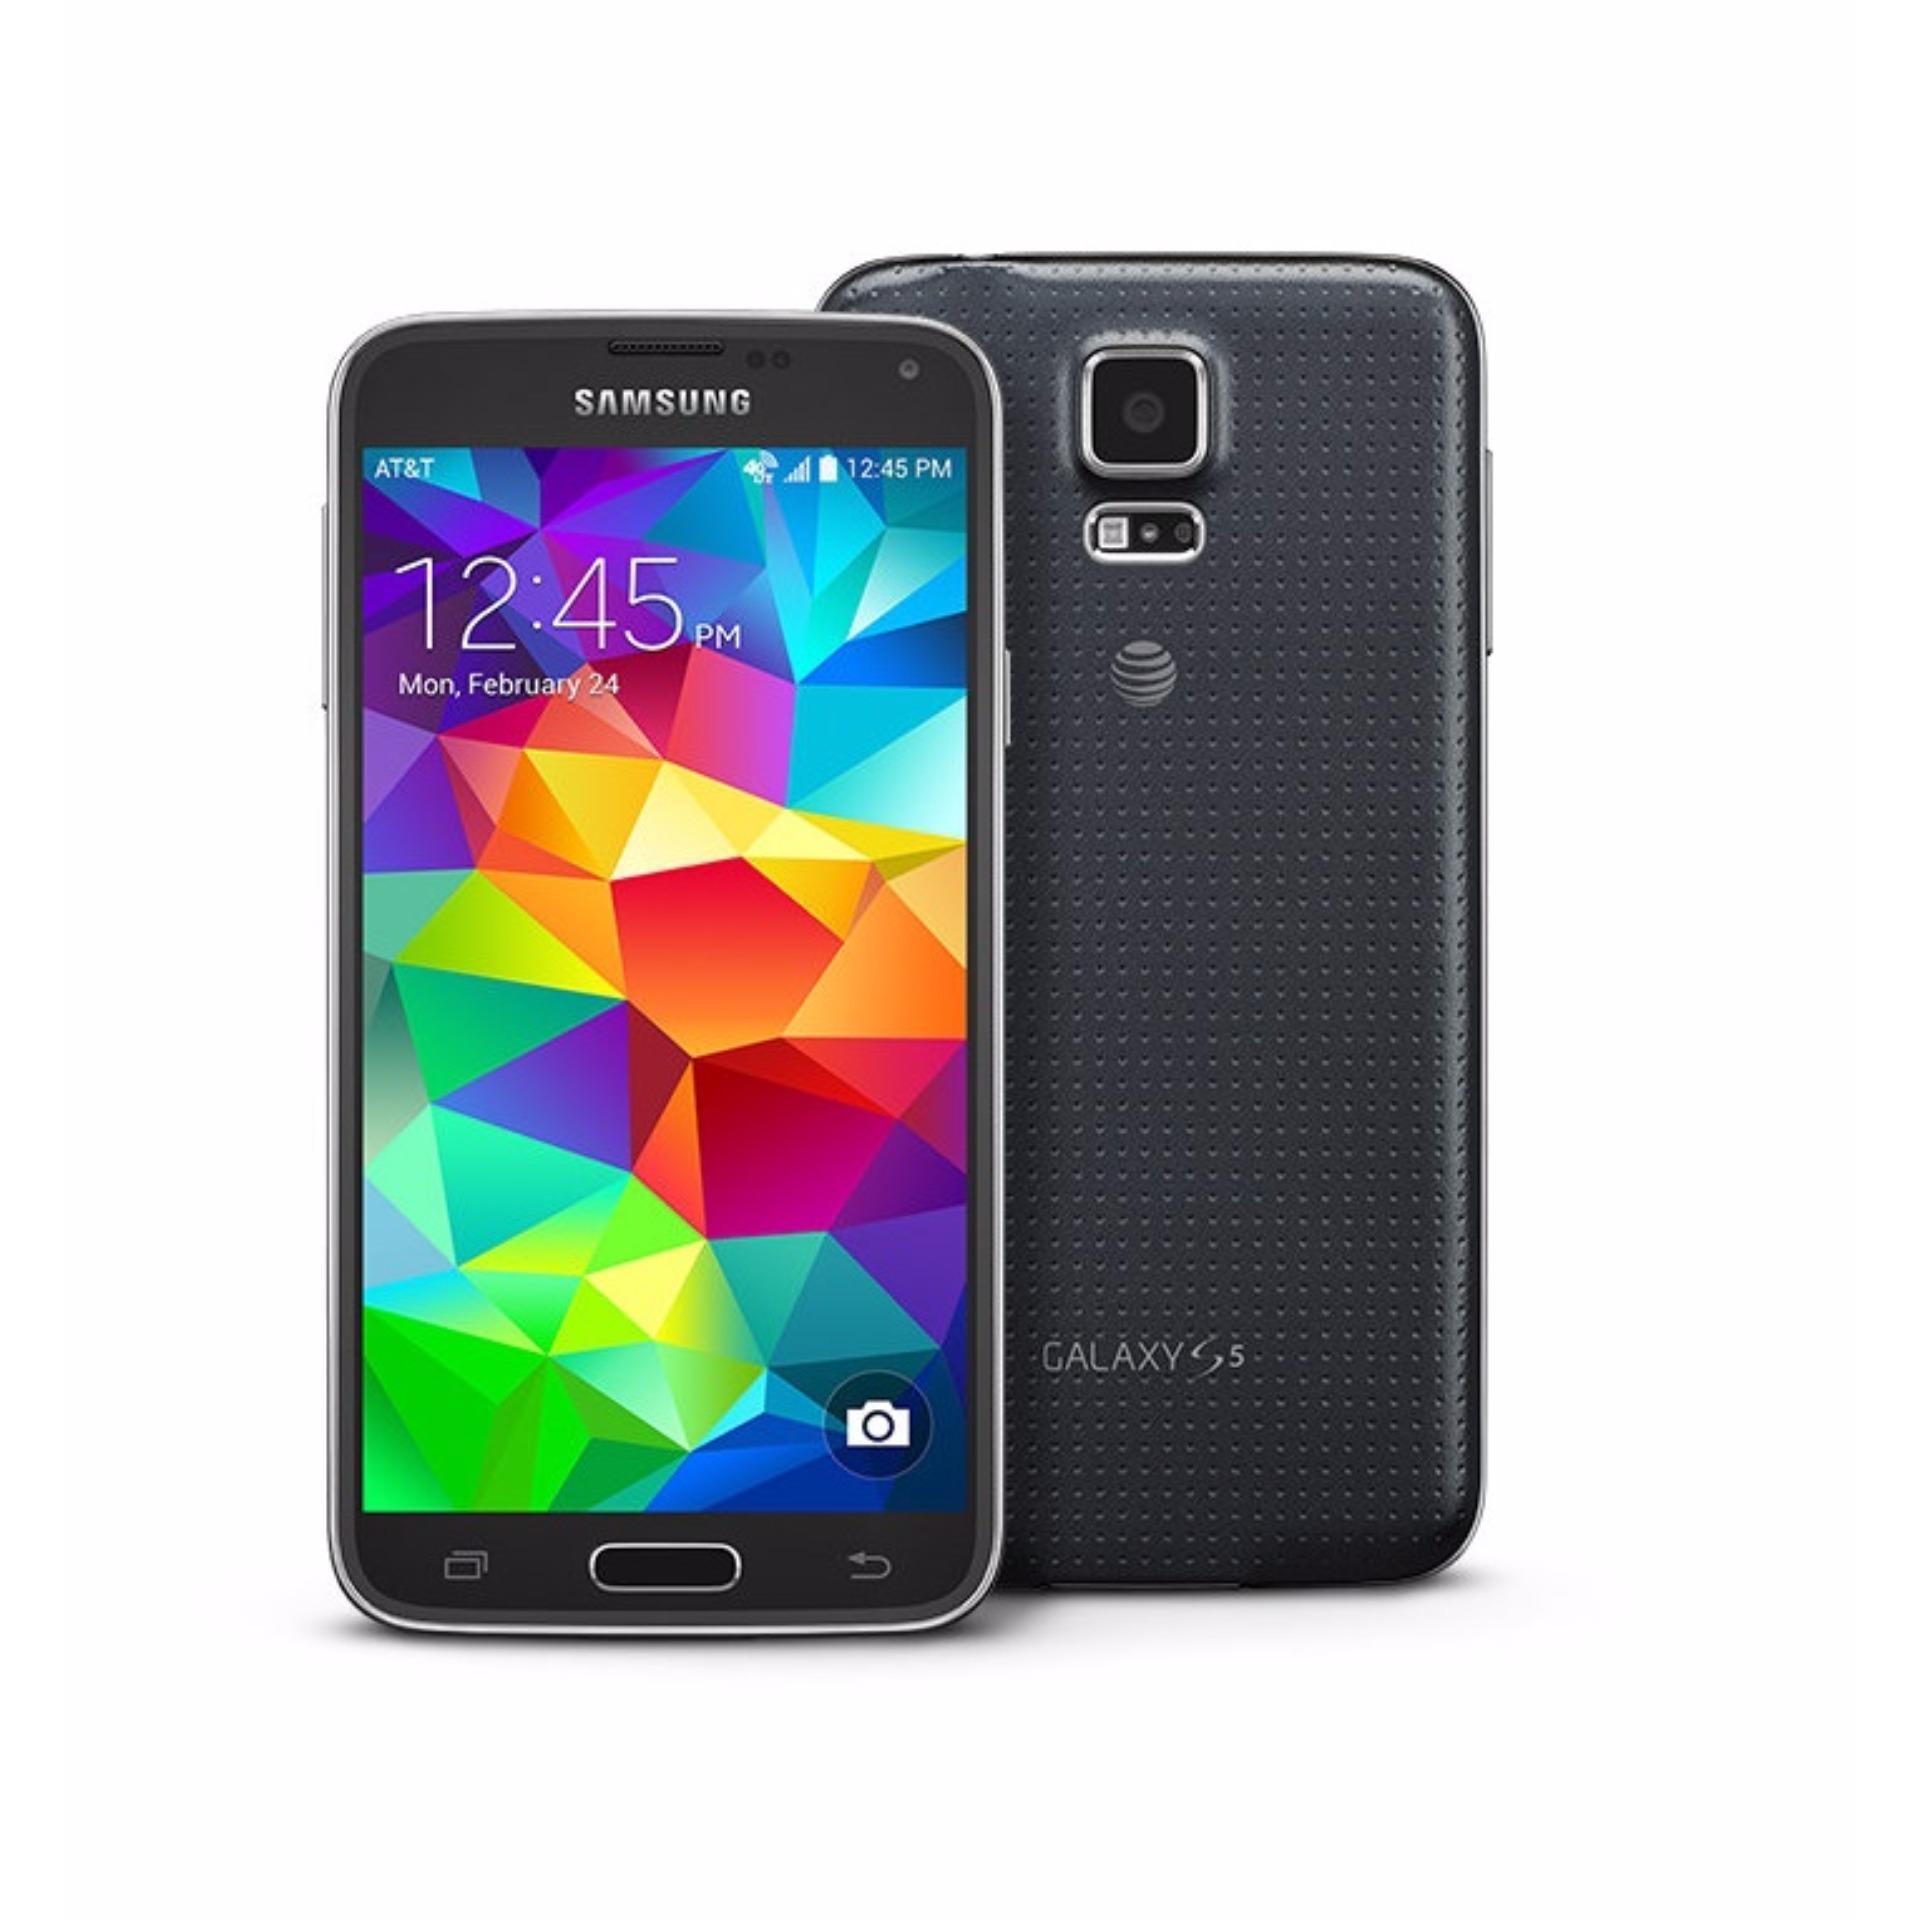 Sony Xperia Z3 Compact Seken Mulus 95 Original Bergaransi Daftar Samsung Galaxy S5